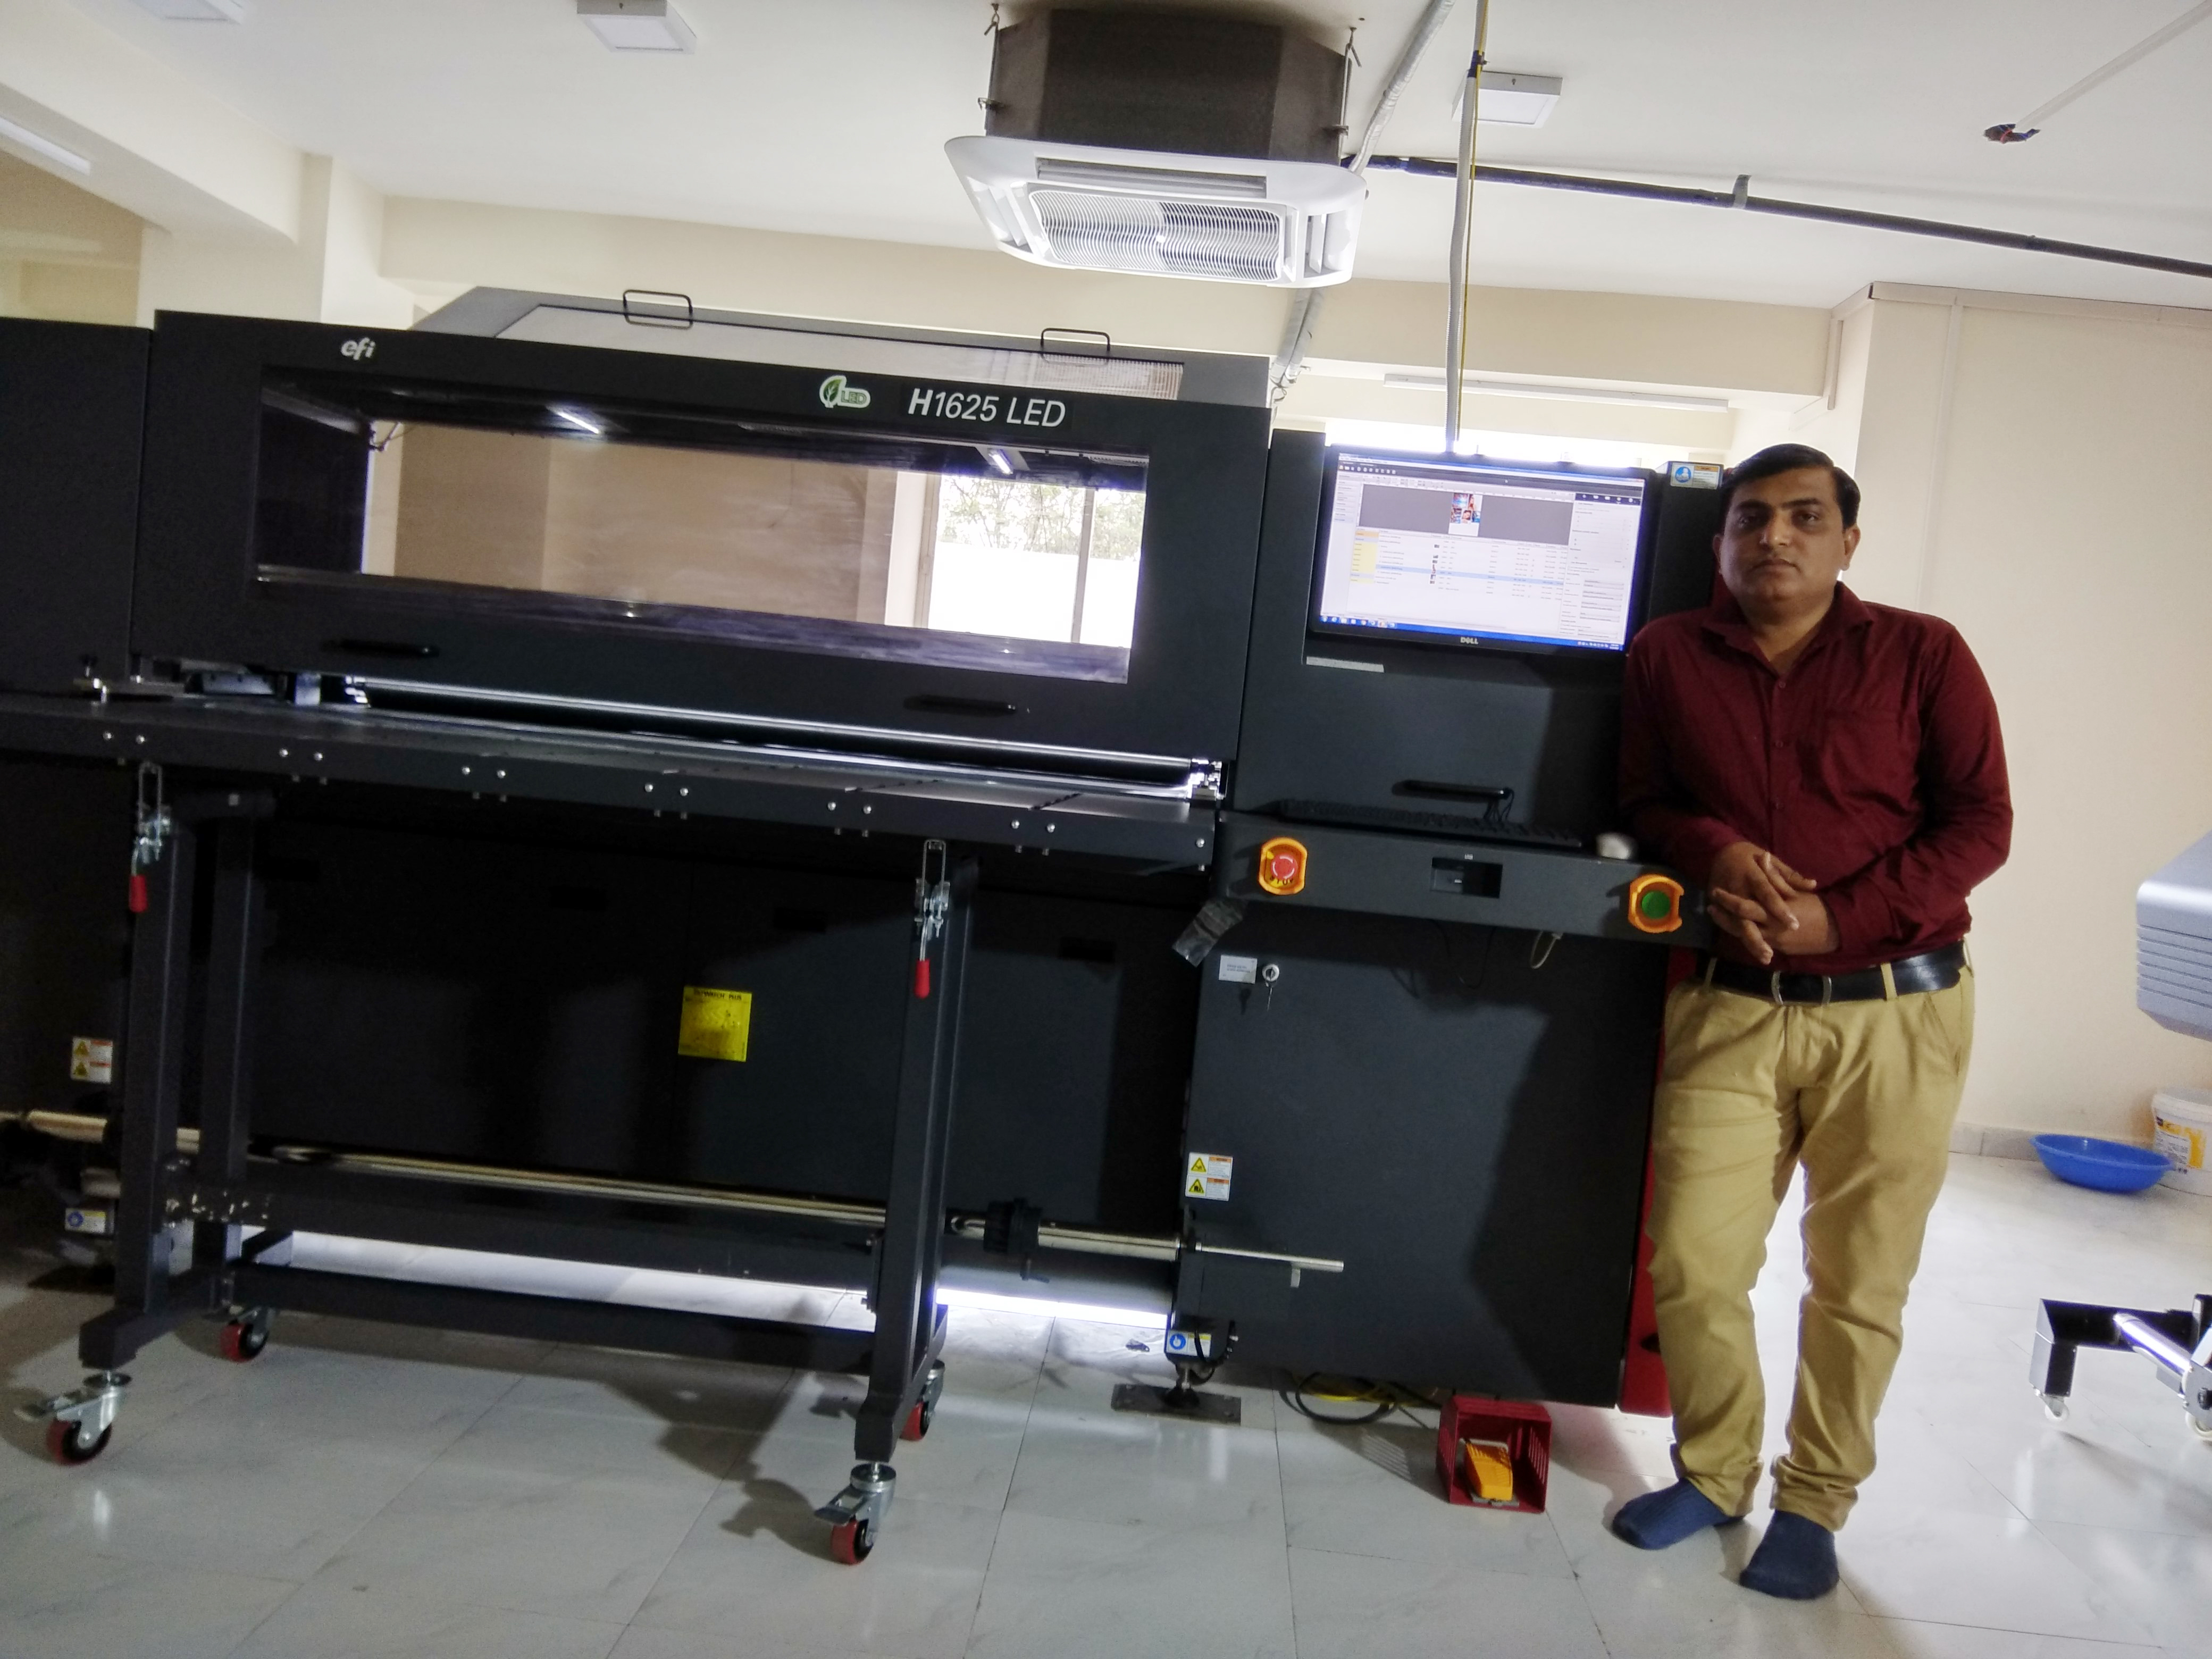 Shubhi Graphics & Multimedia in Indore adopts Efi H1625 LED UV and OKI M64